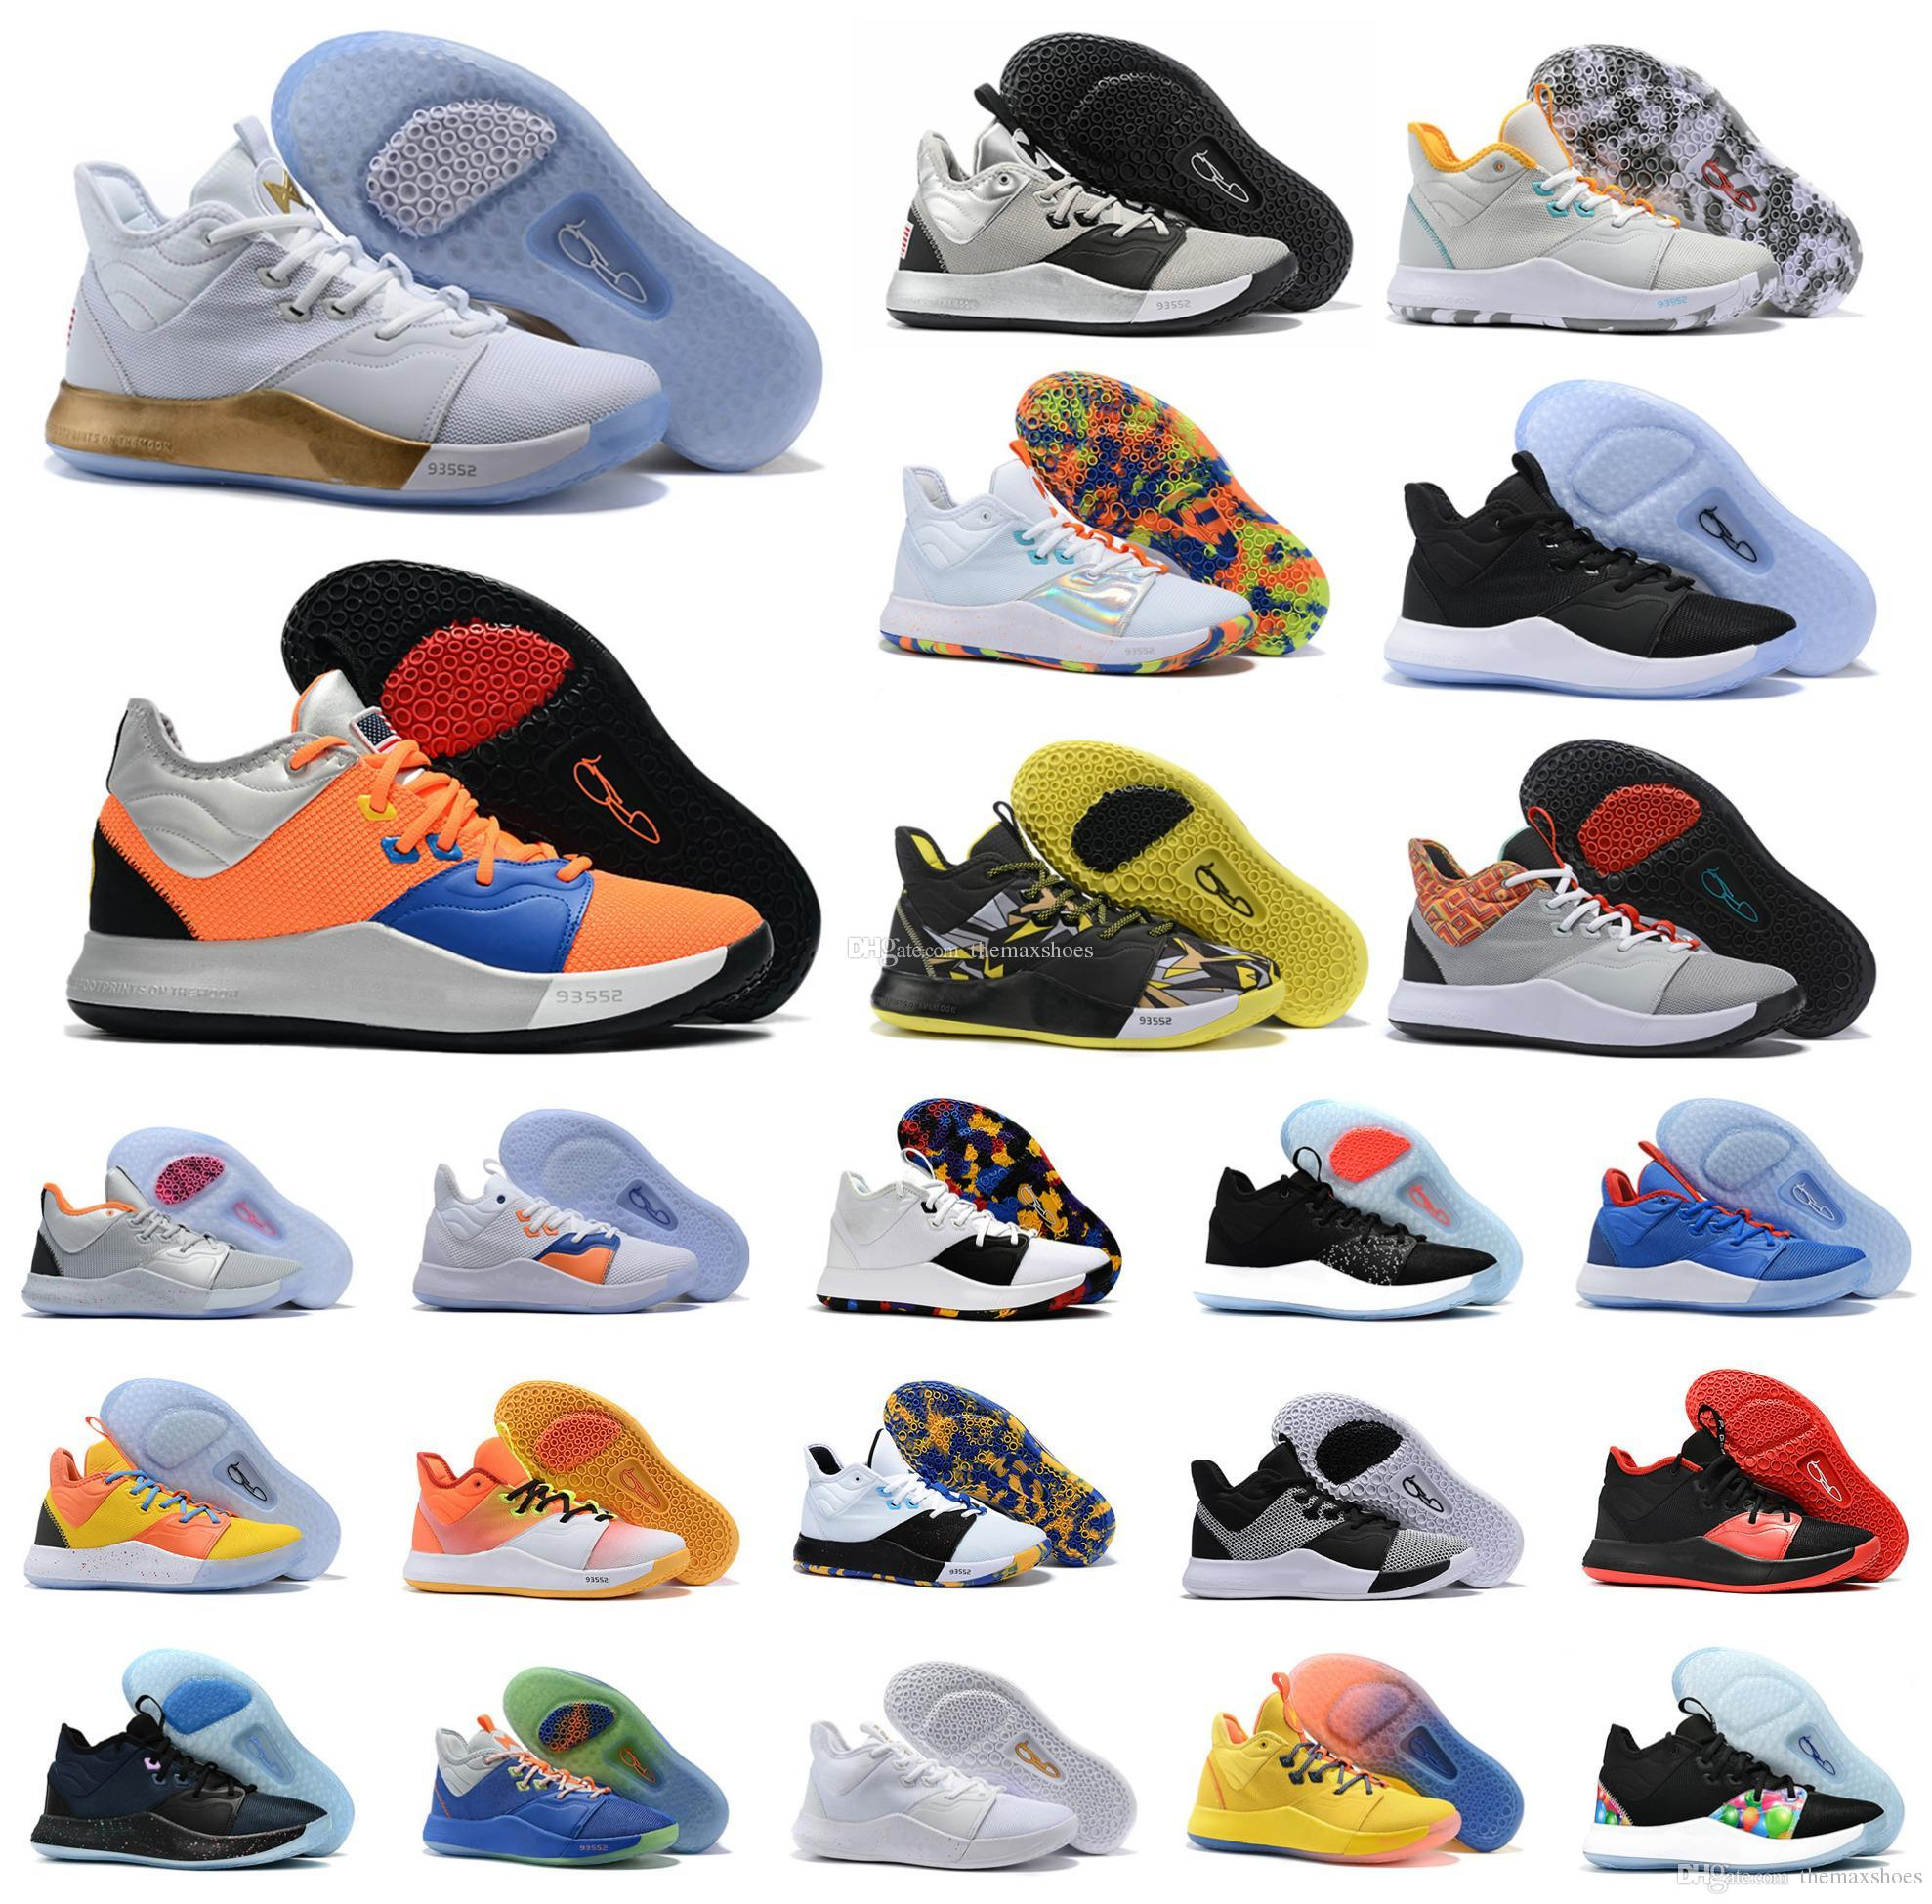 2019 Sıcak Paul George PG 3 3S PALMDALE III P.GEORGE Basketbol Ayakkabı Ucuz PG3 Starry Mavi Turuncu Kırmızı Siyah Spor Sneakers Boyut US7-12